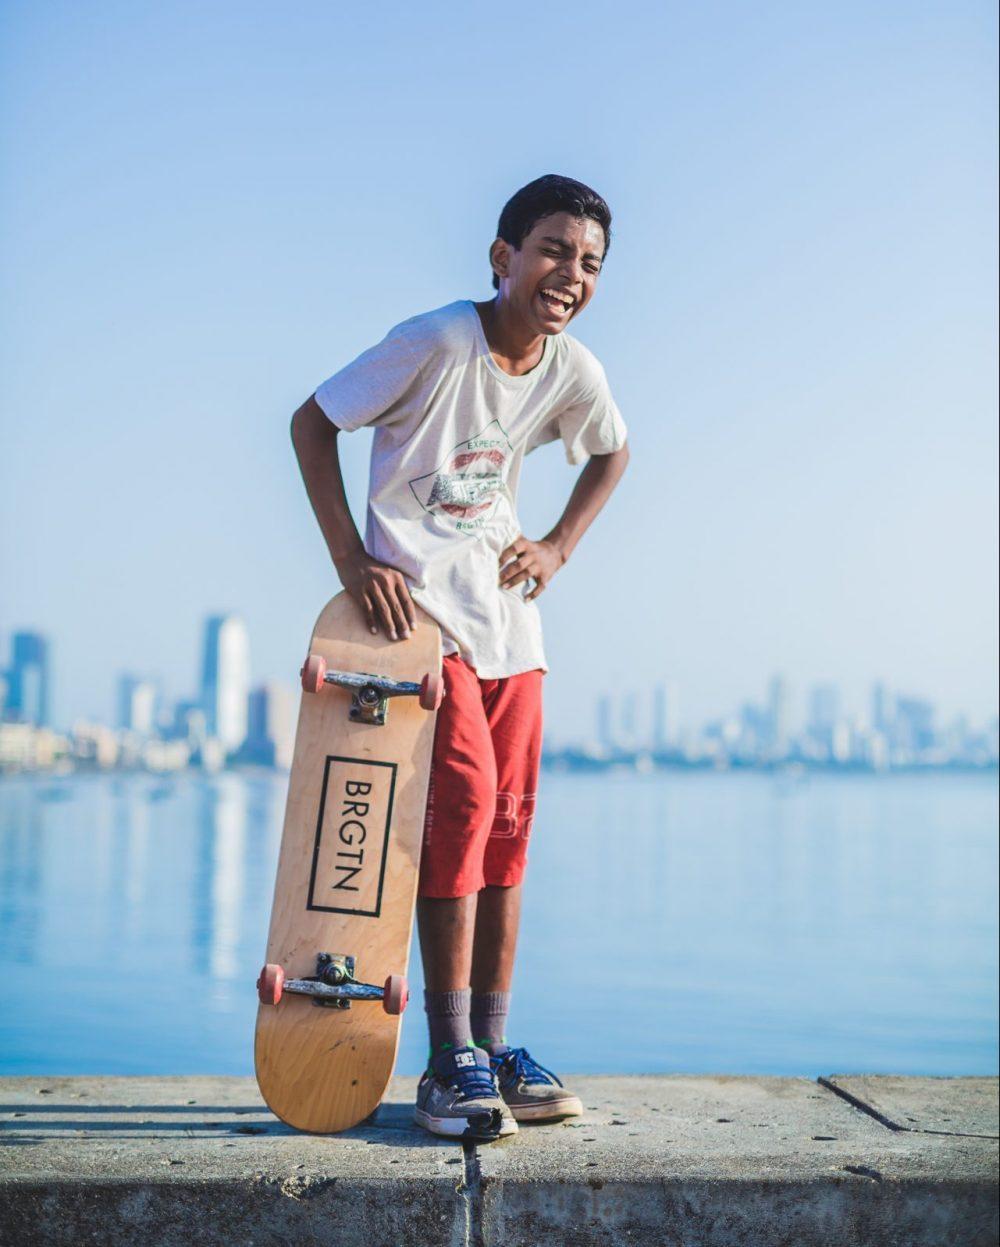 Humans Of Skateboarding In India (Mumbai) III